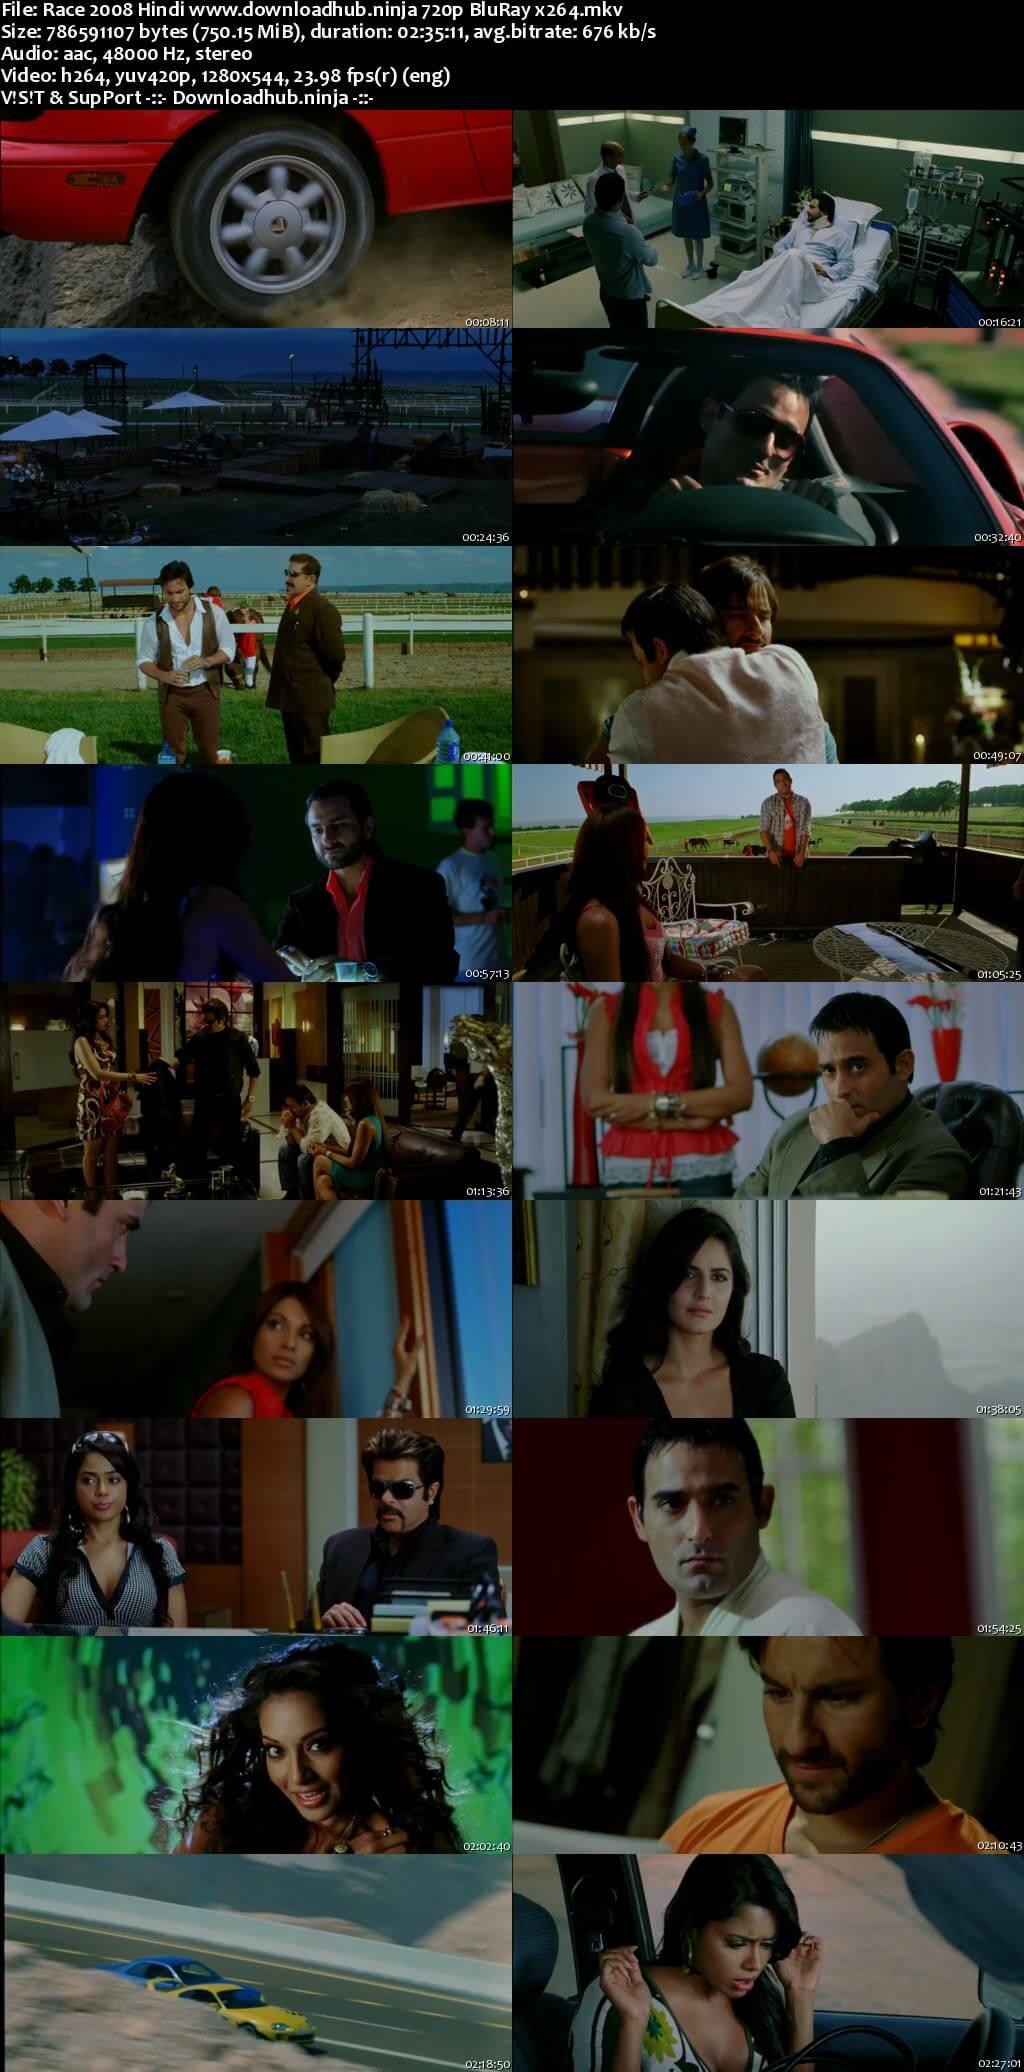 Race 2008 Hindi 720p BluRay x264